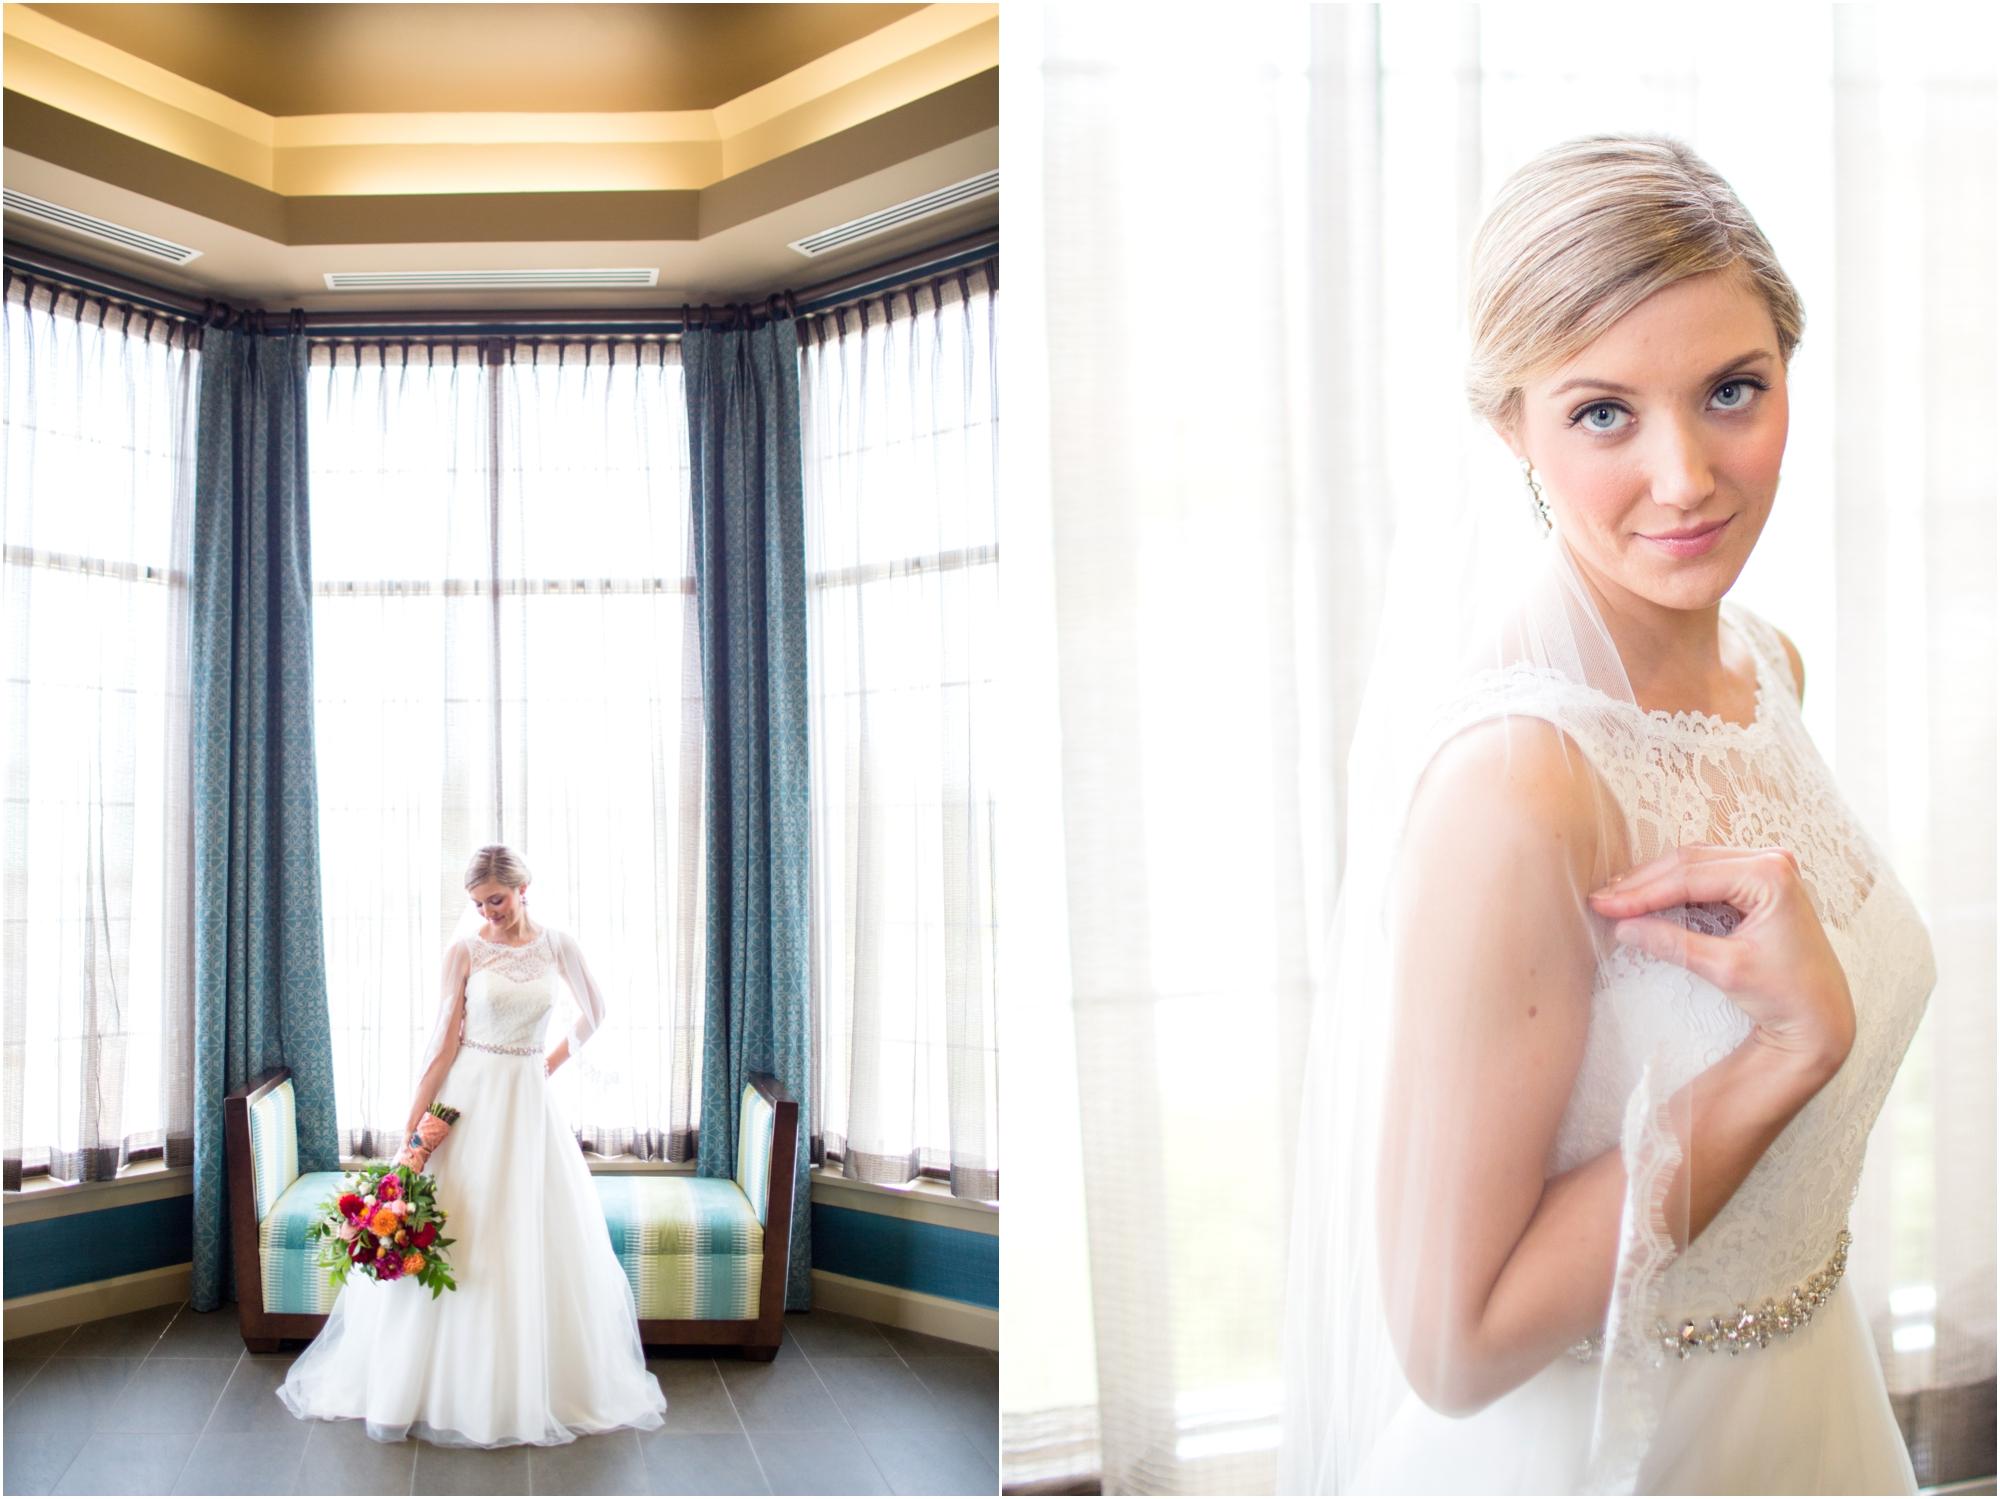 1-Finkel Wedding Getting Ready-154_anna grace photography maryland wedding photographer turf valley.jpg